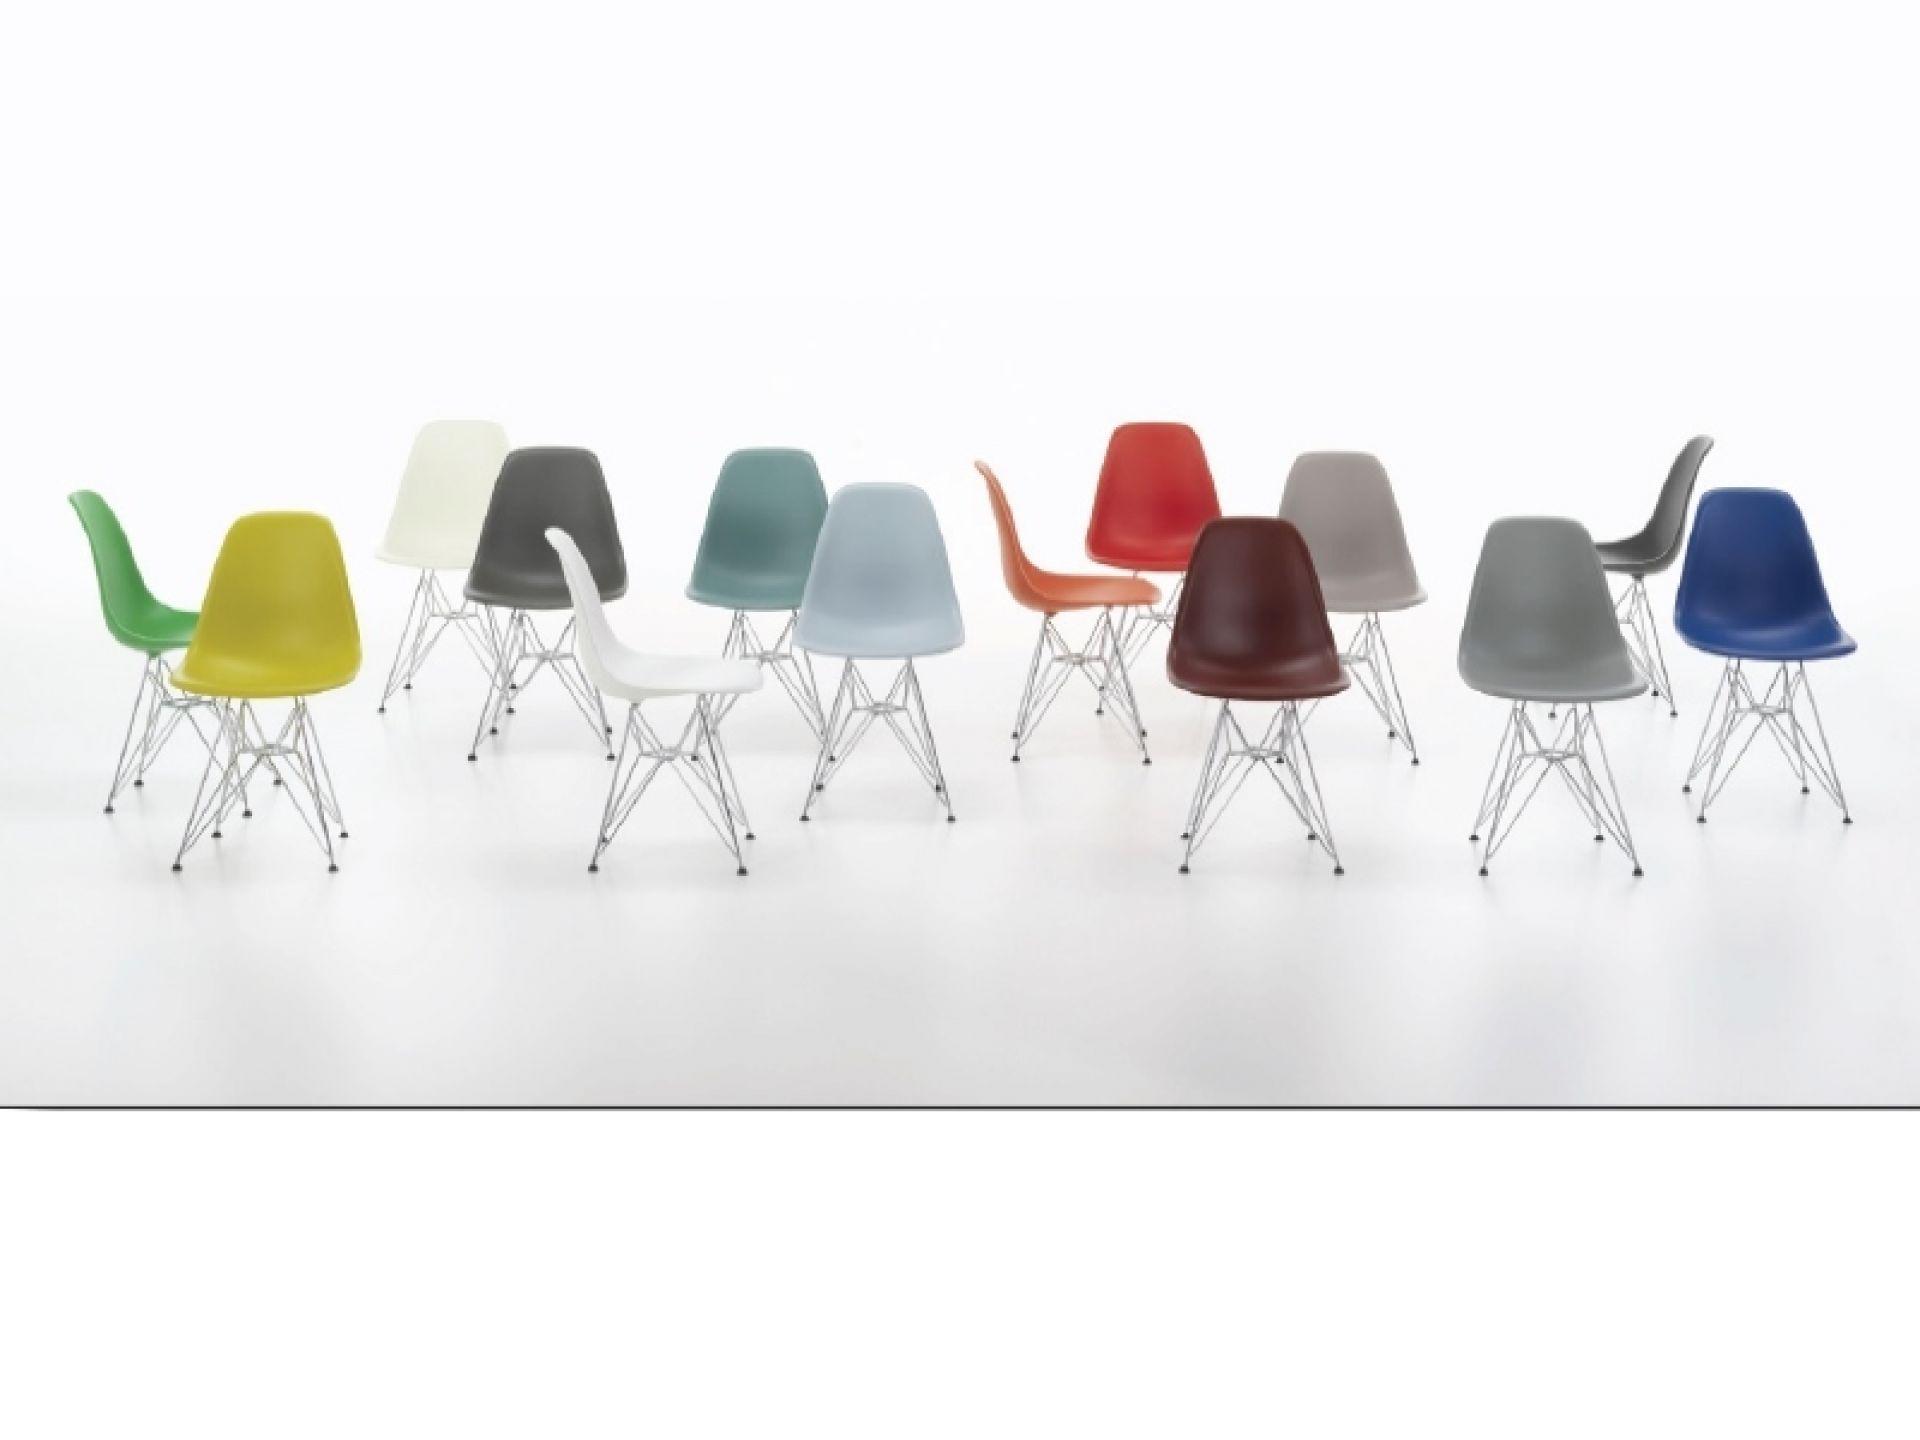 Eames Plastic Side Chair DSR Stuhl Vitra Classic rot Basic dark | Classic rot | basic dark | VITRA 44030000 28 BASIC DARK